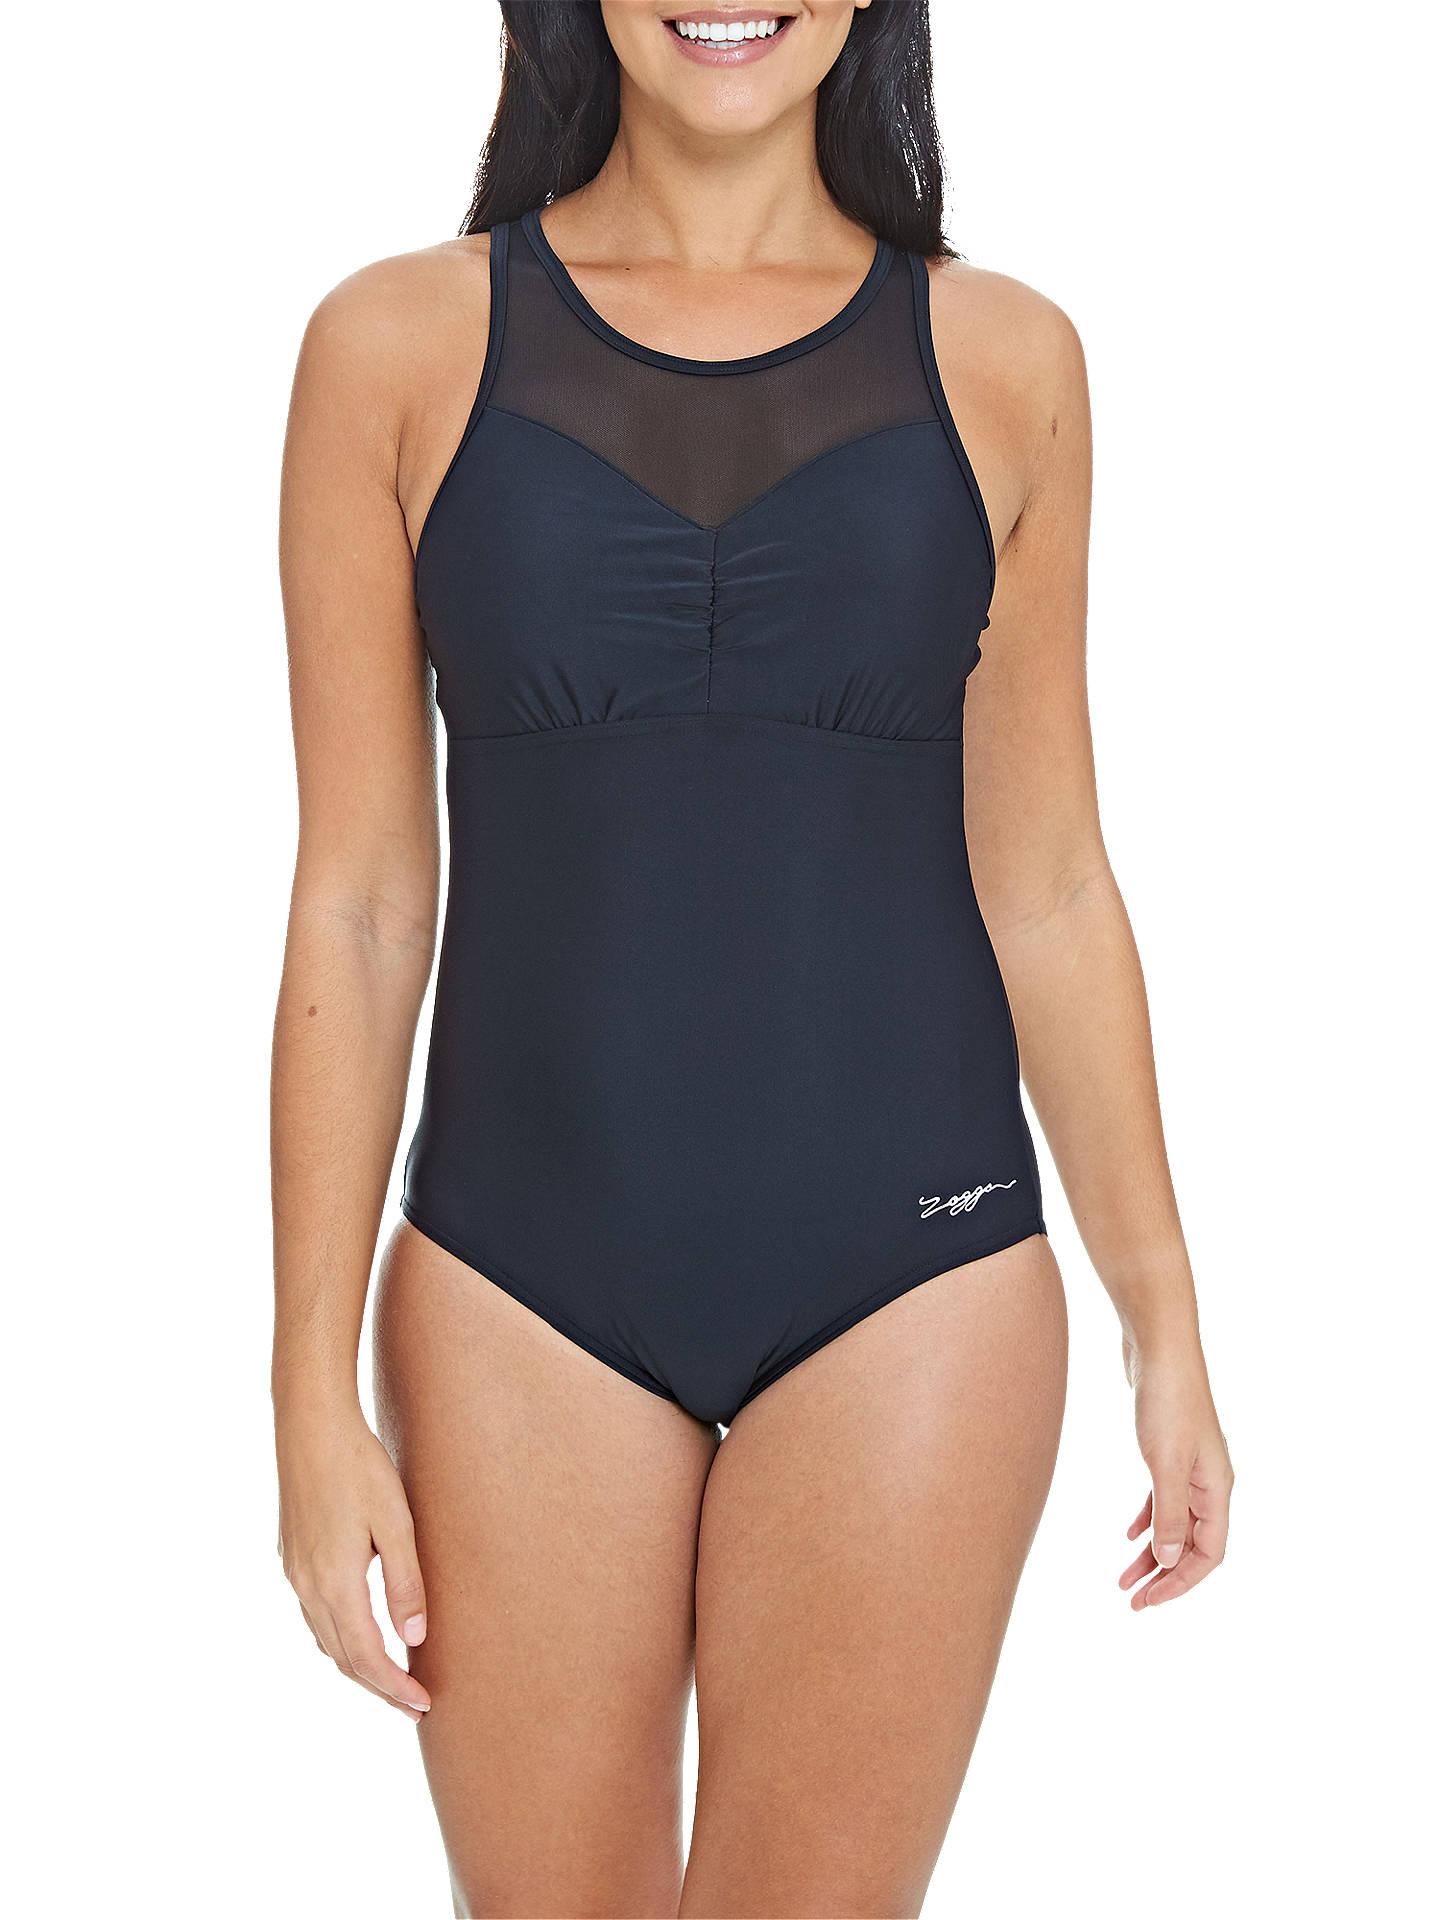 6f4c01298c5be Buy Zoggs Marengo Mesh Clipback Swimsuit, Black, 10 Online at johnlewis.com  ...